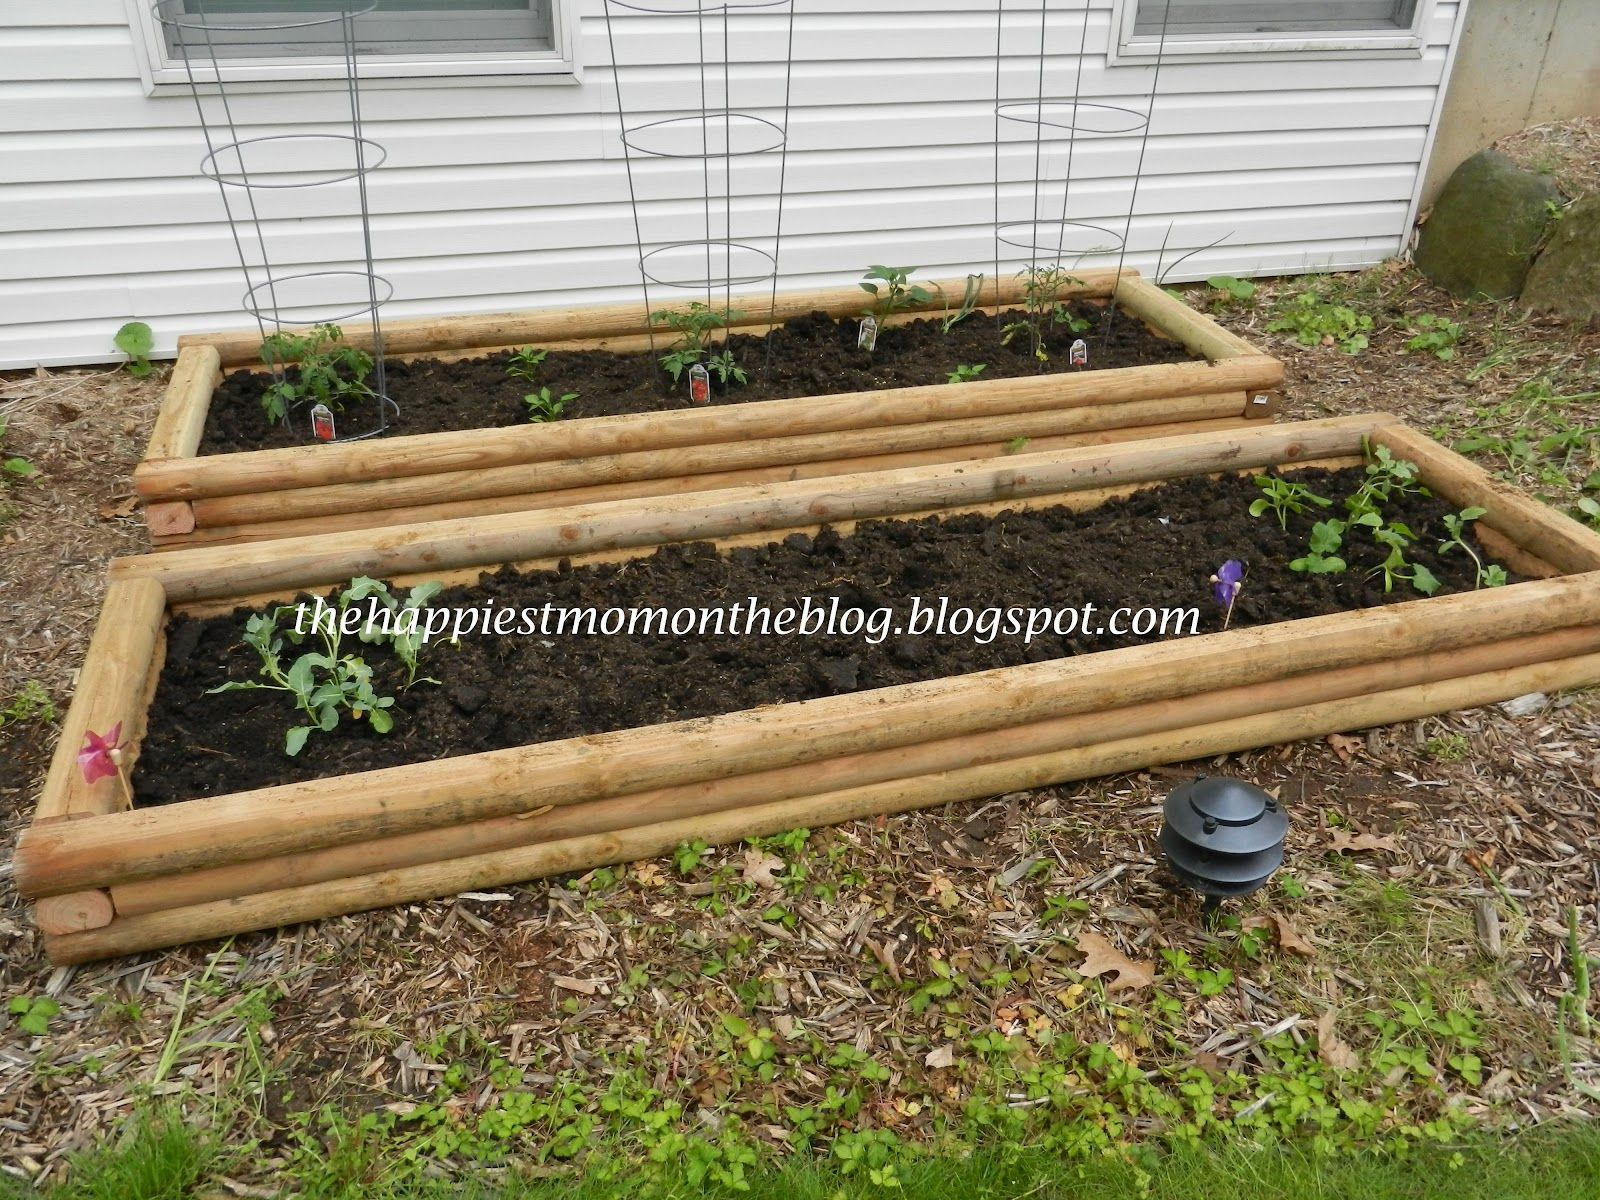 Medium Crop Of Home Depot Vegetable Garden Box